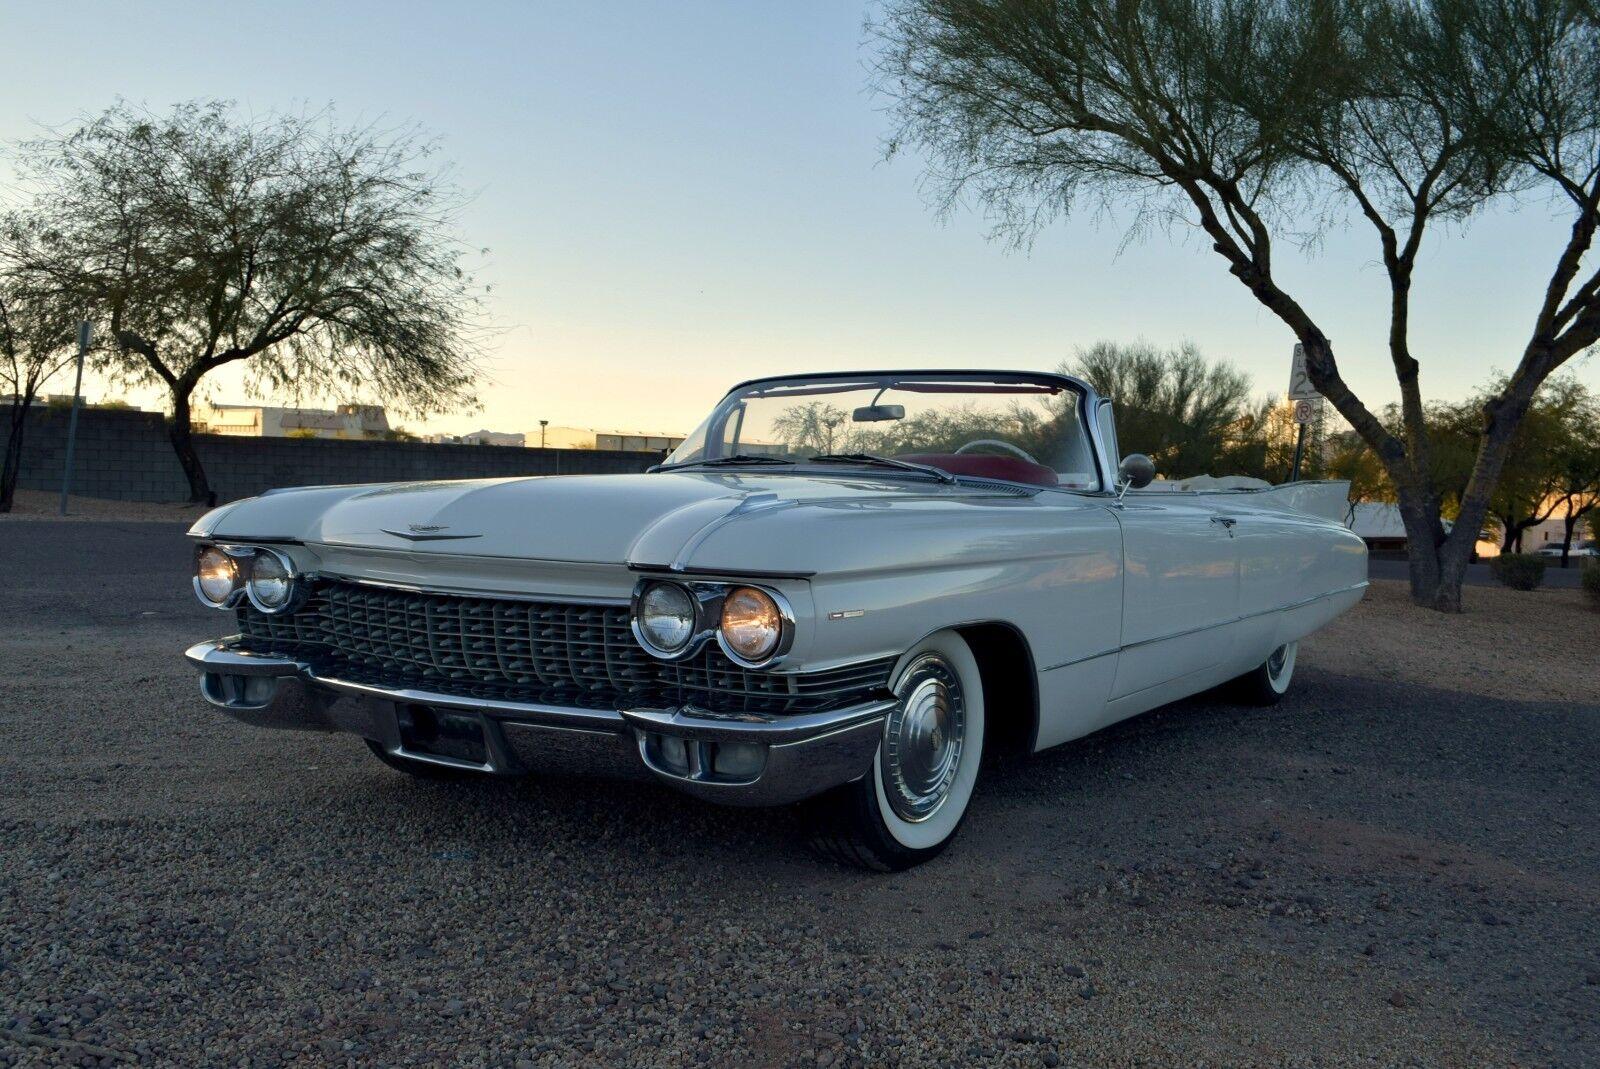 1960 Cadillac Deville Series 62 Convertible 1960 Cadillac Series 62 Convertible - Fresh Paint, Interior, & Top - NICE Driver